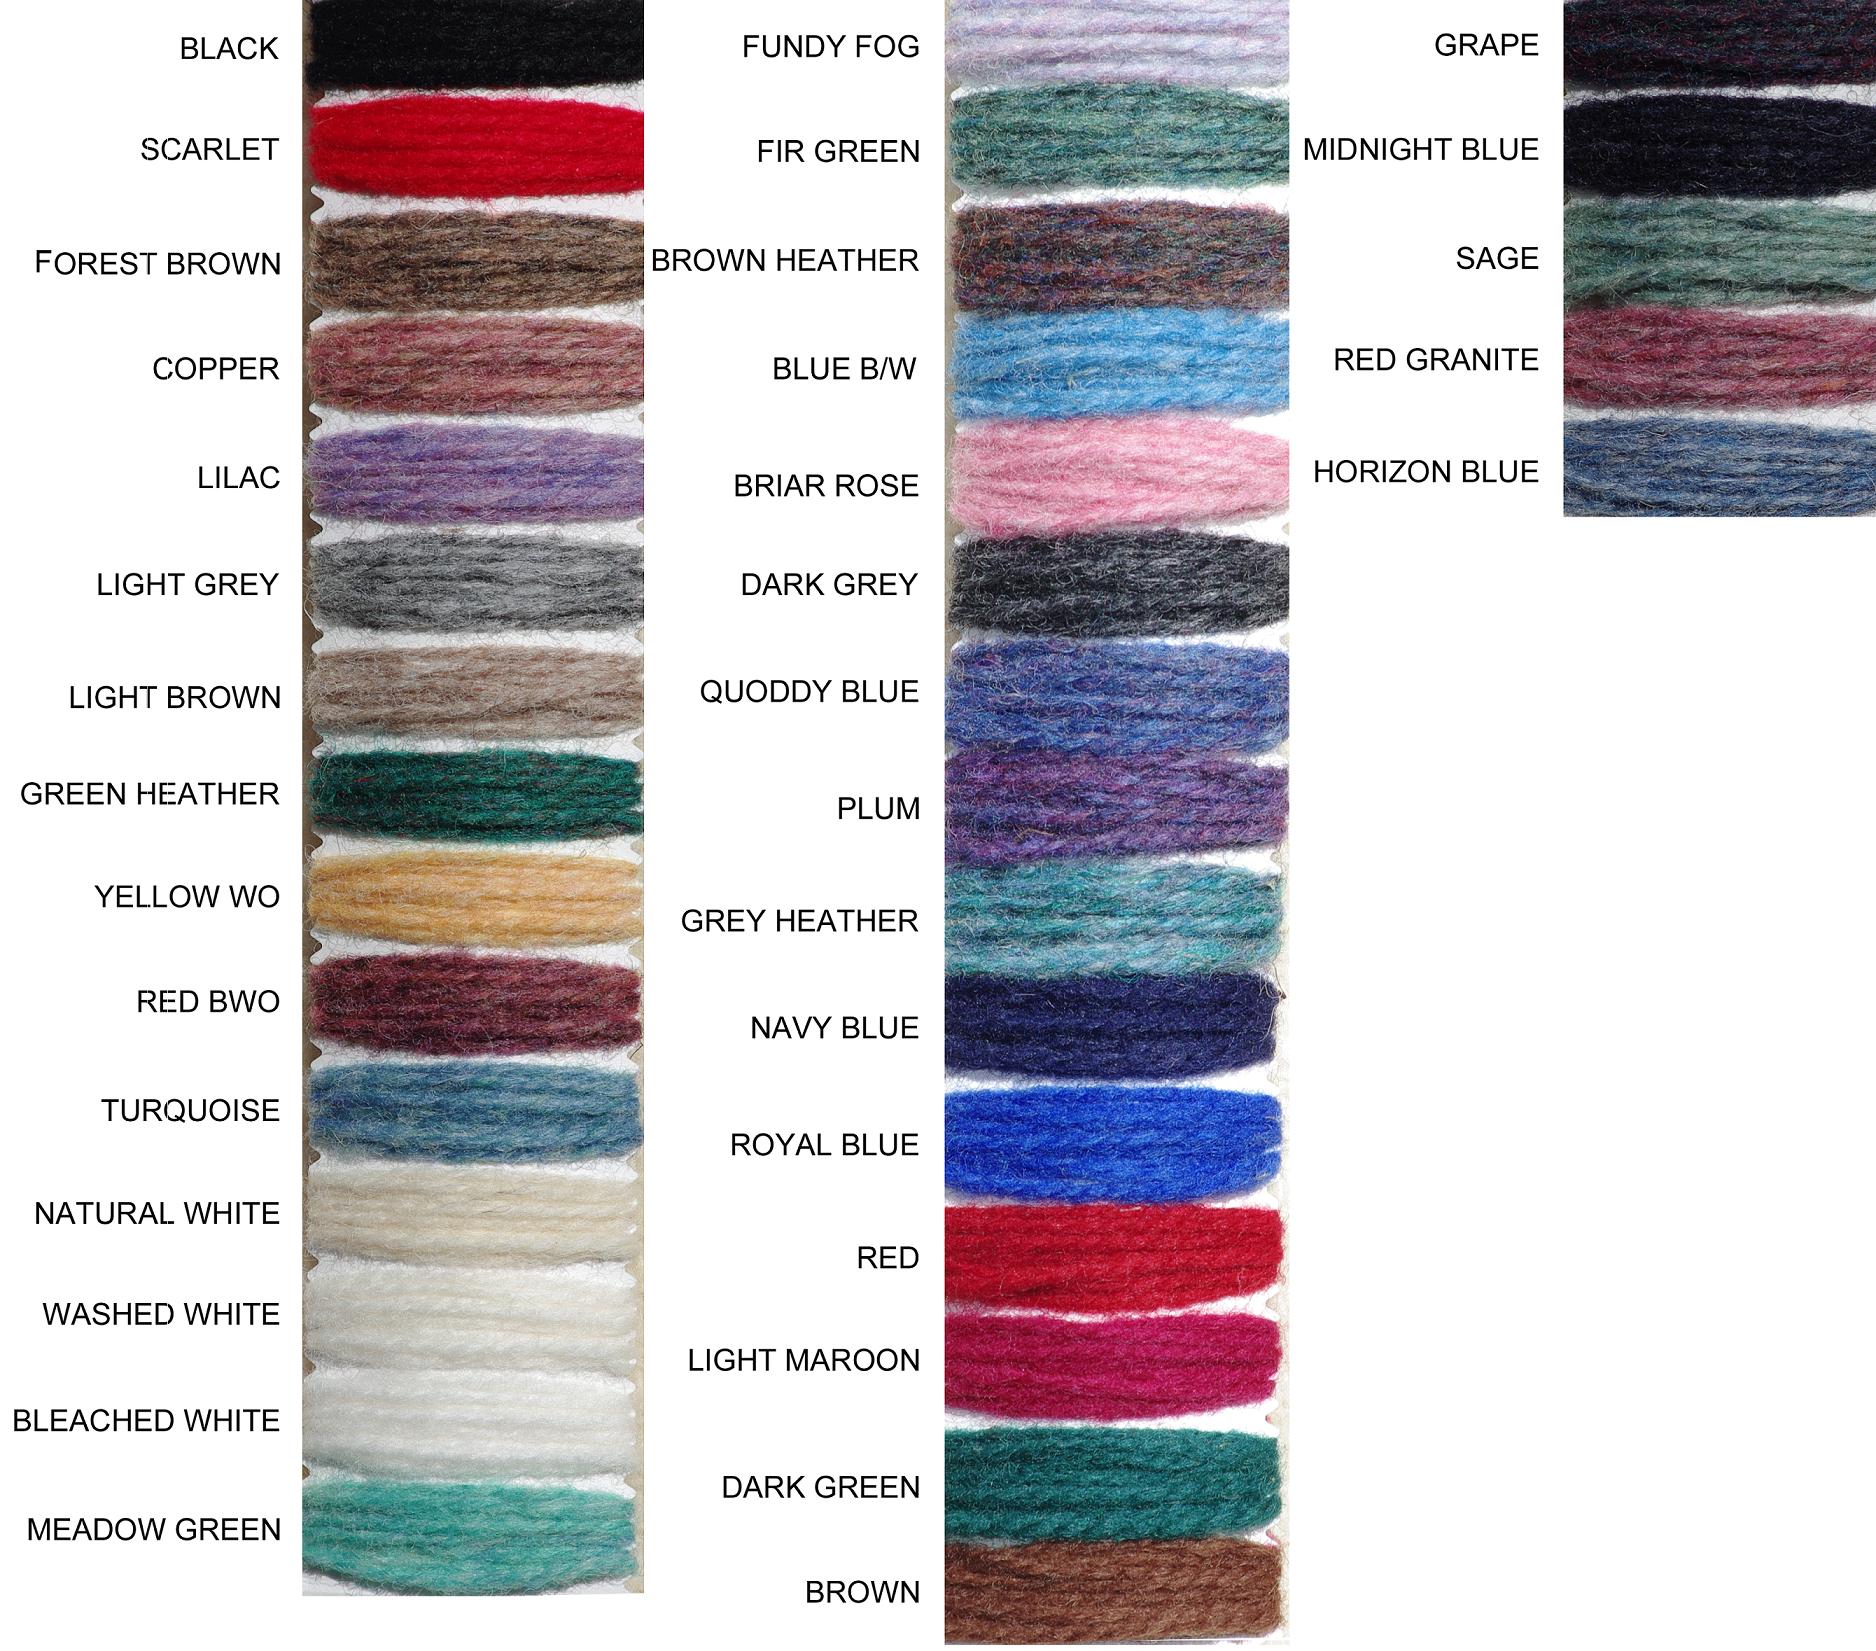 Wool Knitting Yarns – Wool Knitting Yarn from Briggs & Little Mill Ltd